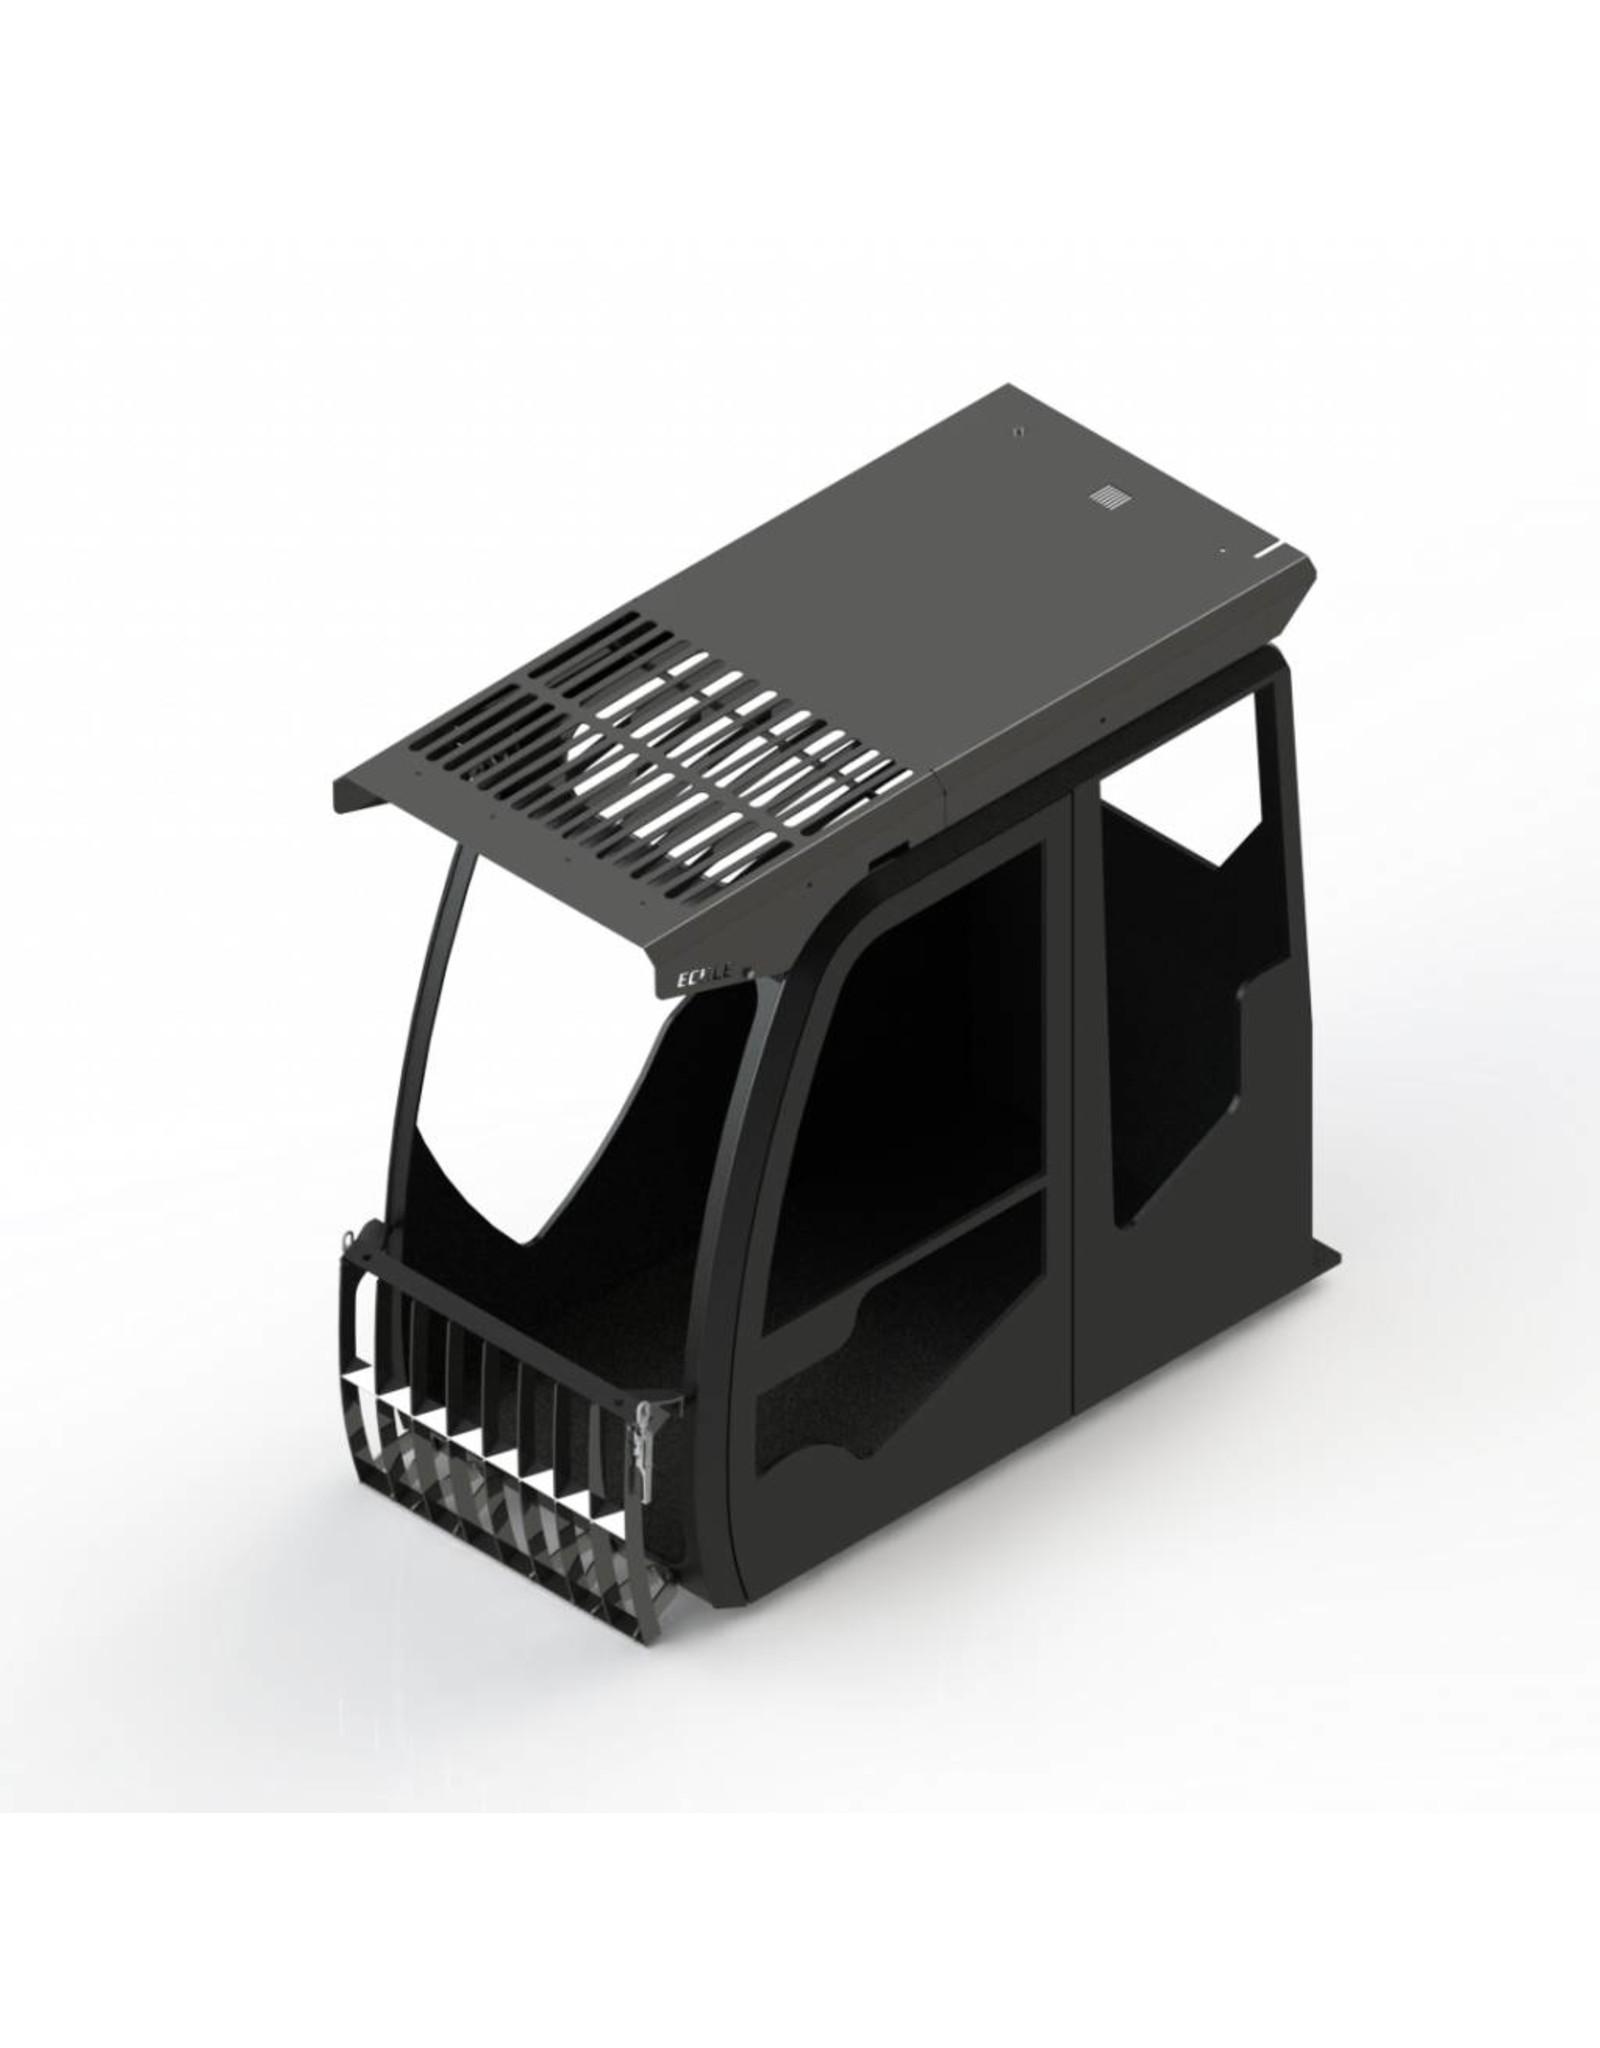 Echle Hartstahl GmbH FOPS for Liebherr A 914